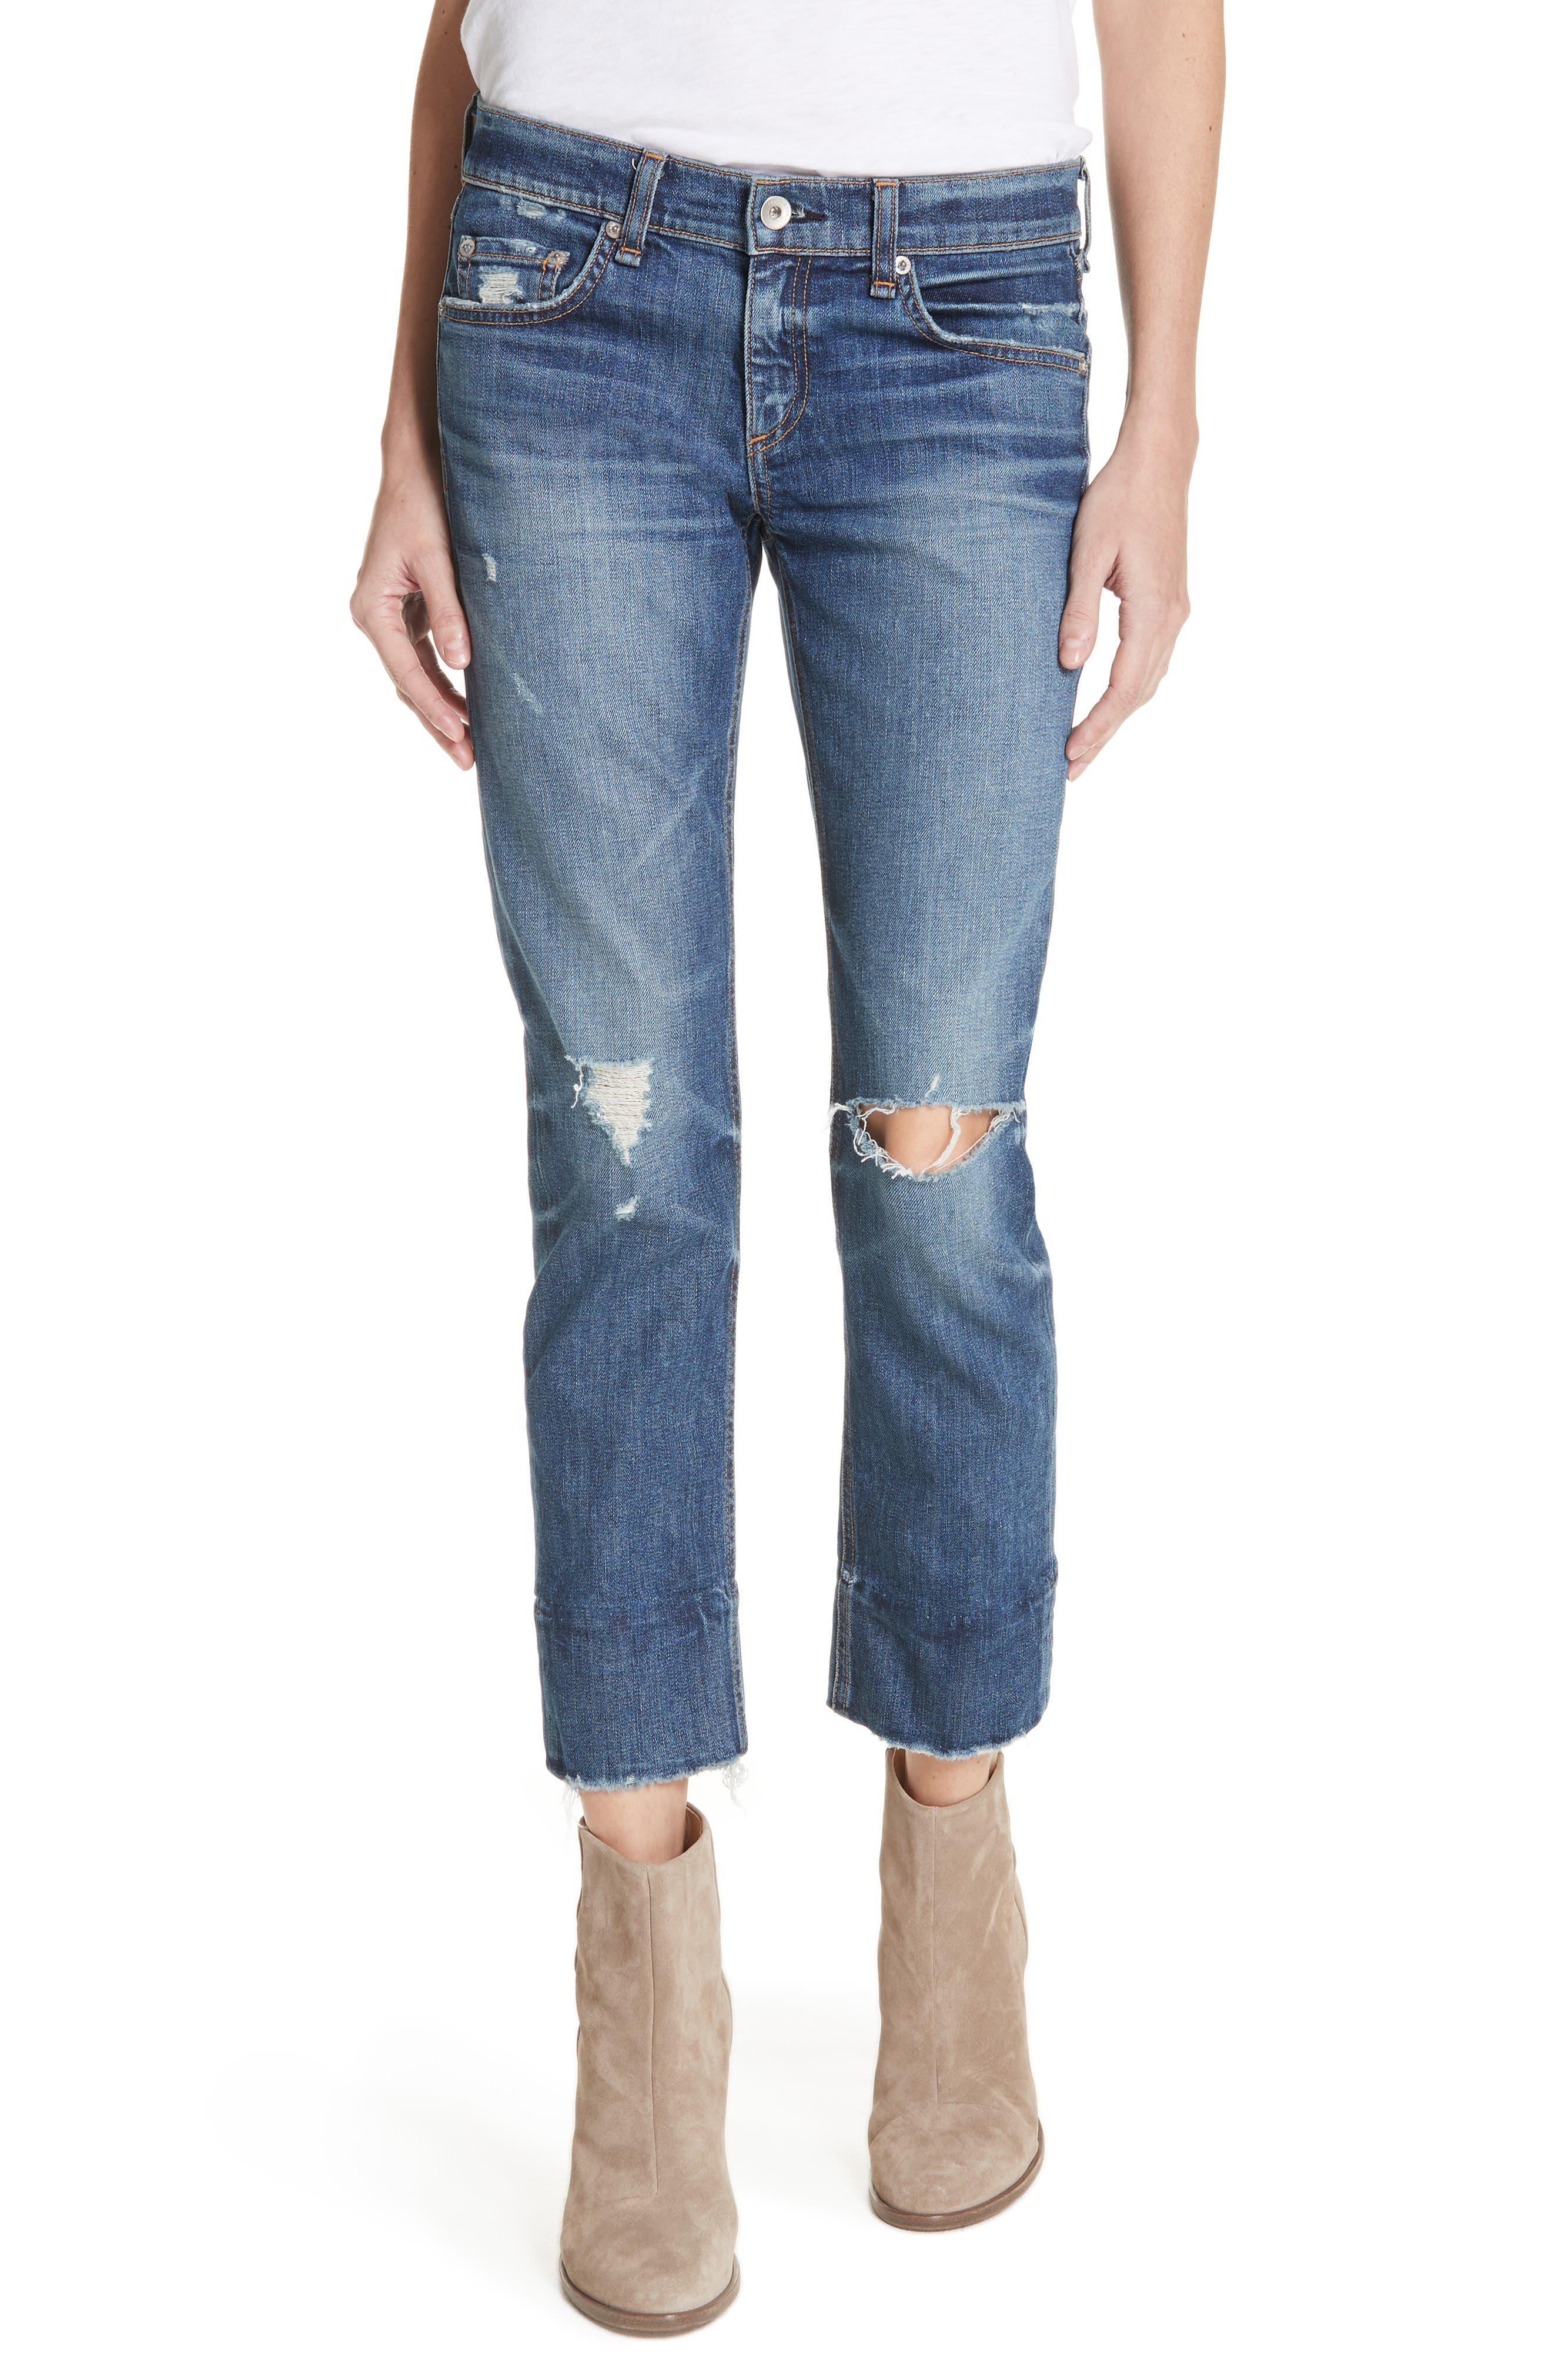 Main Image - rag & bone/JEAN Dre Ankle Slim Boyfriend Jeans (Deville)